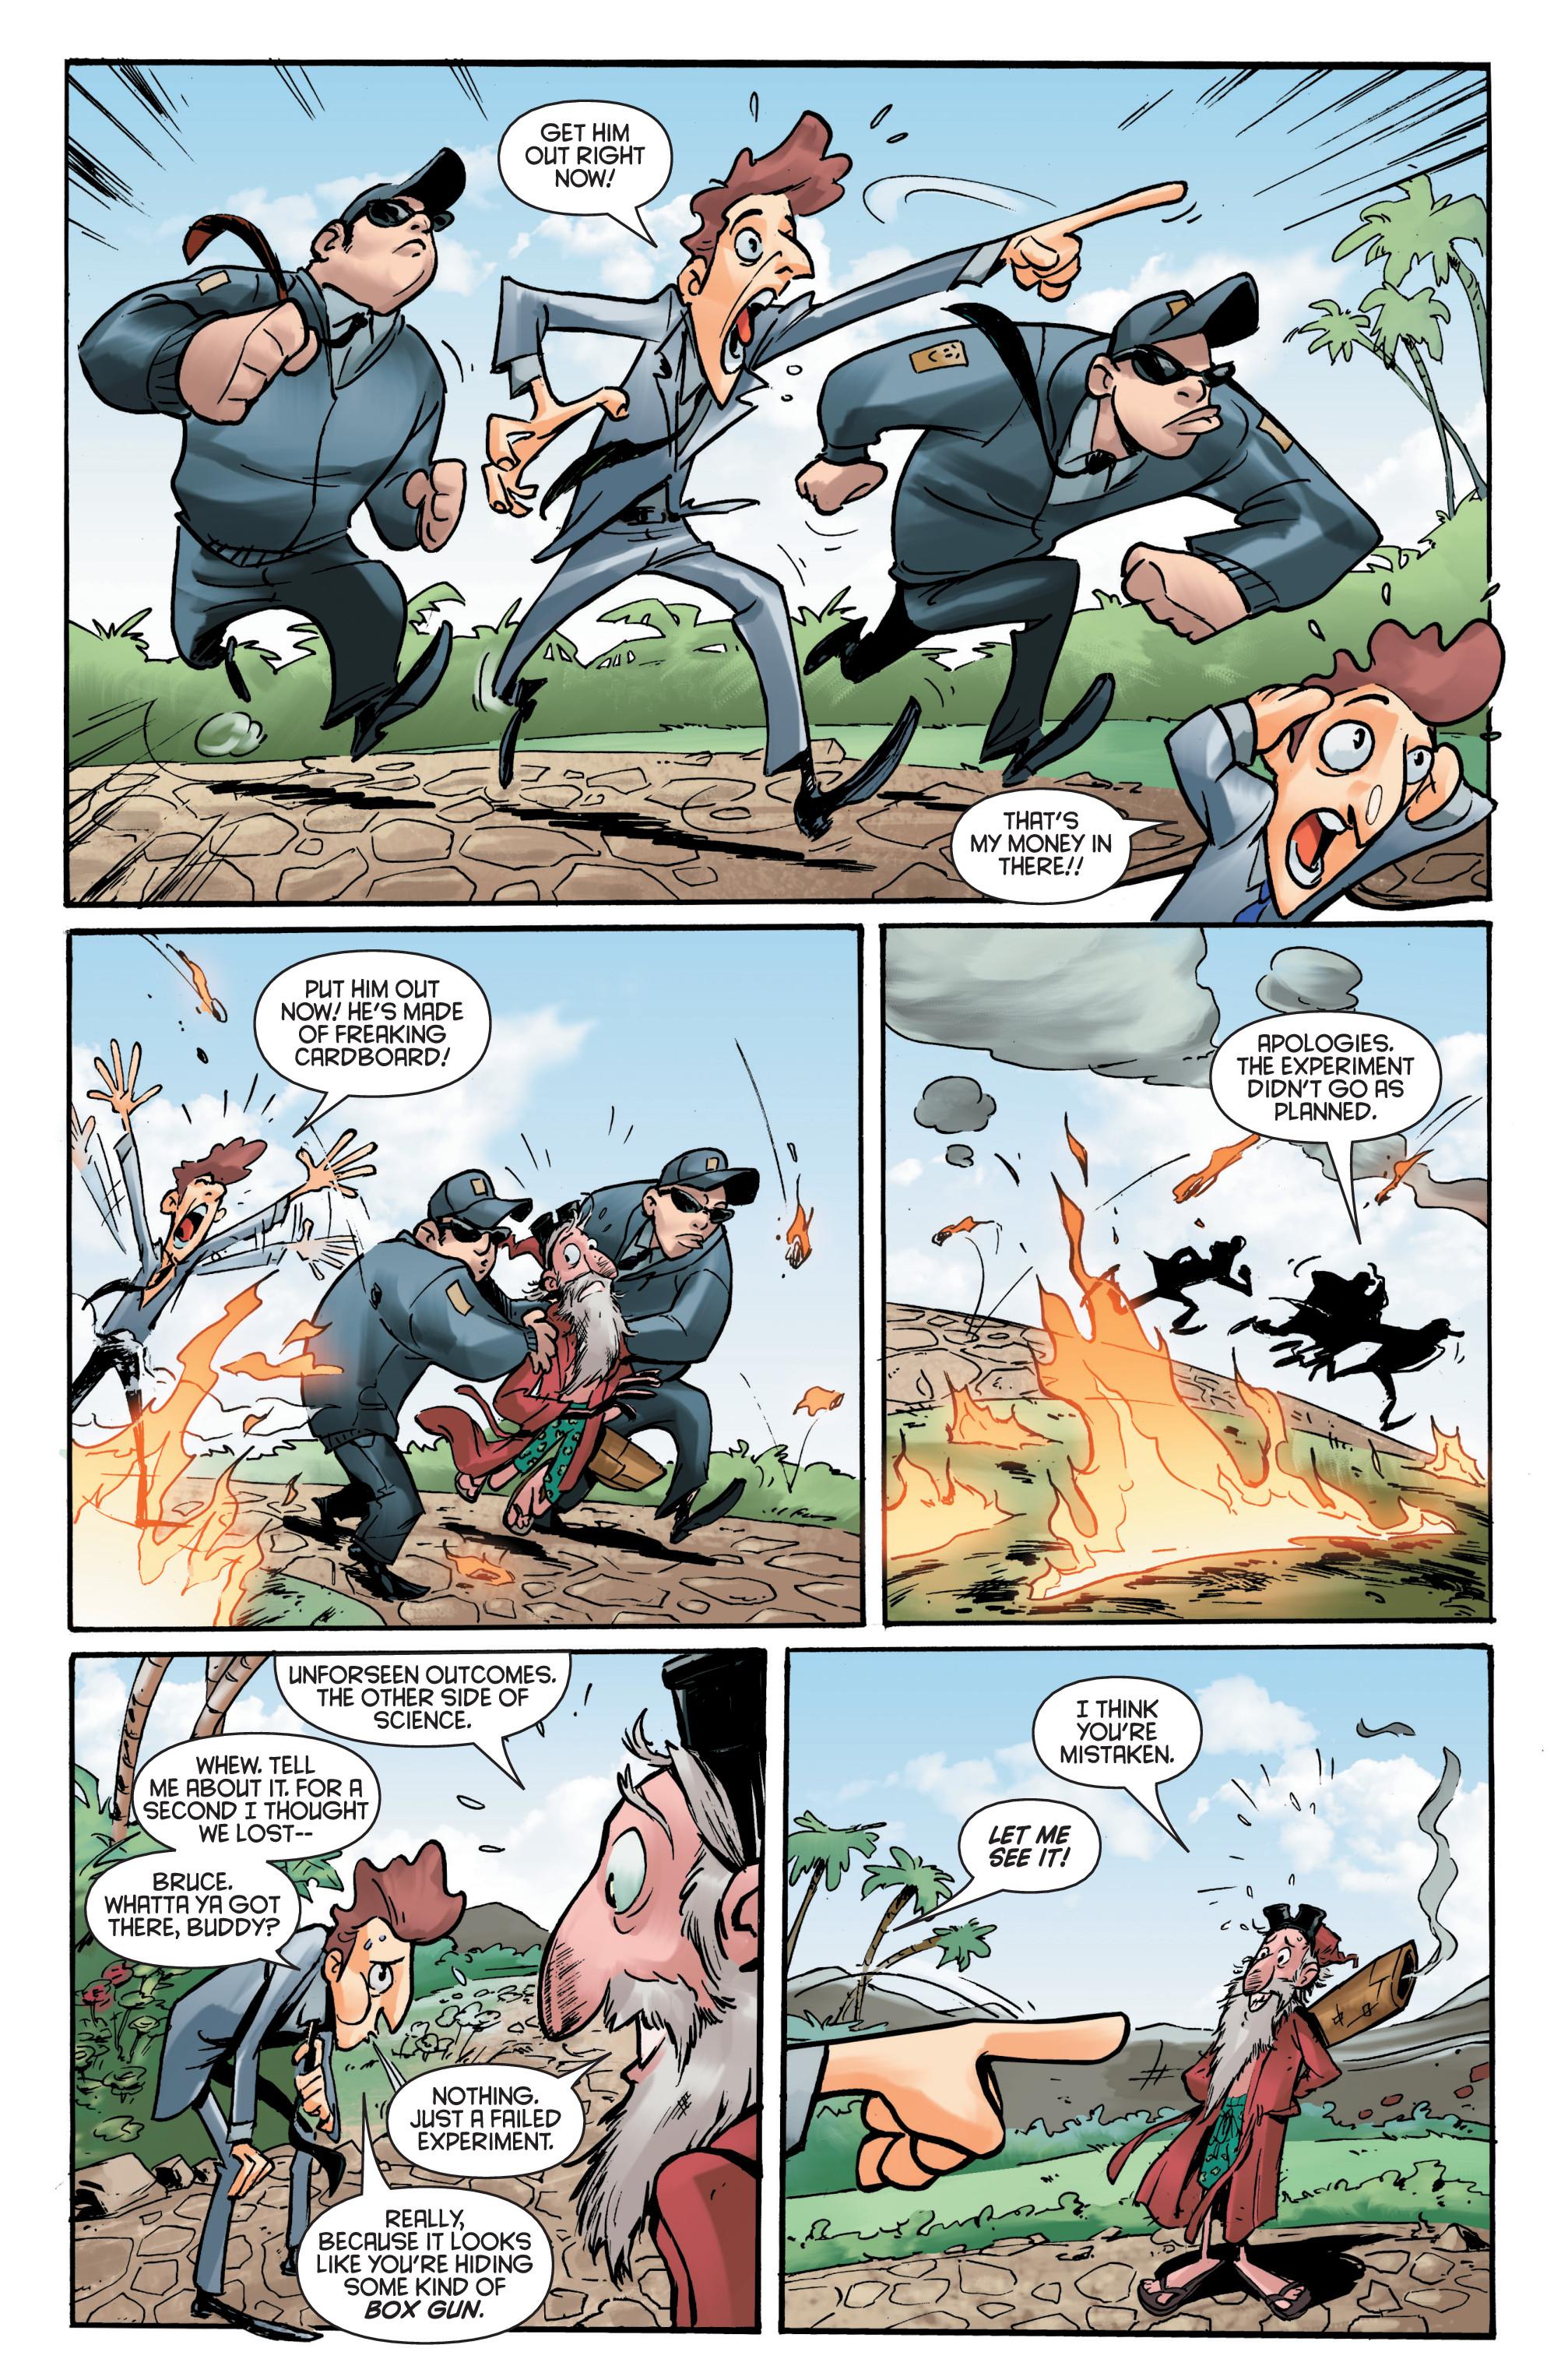 Read online Smosh comic -  Issue #5 - 14